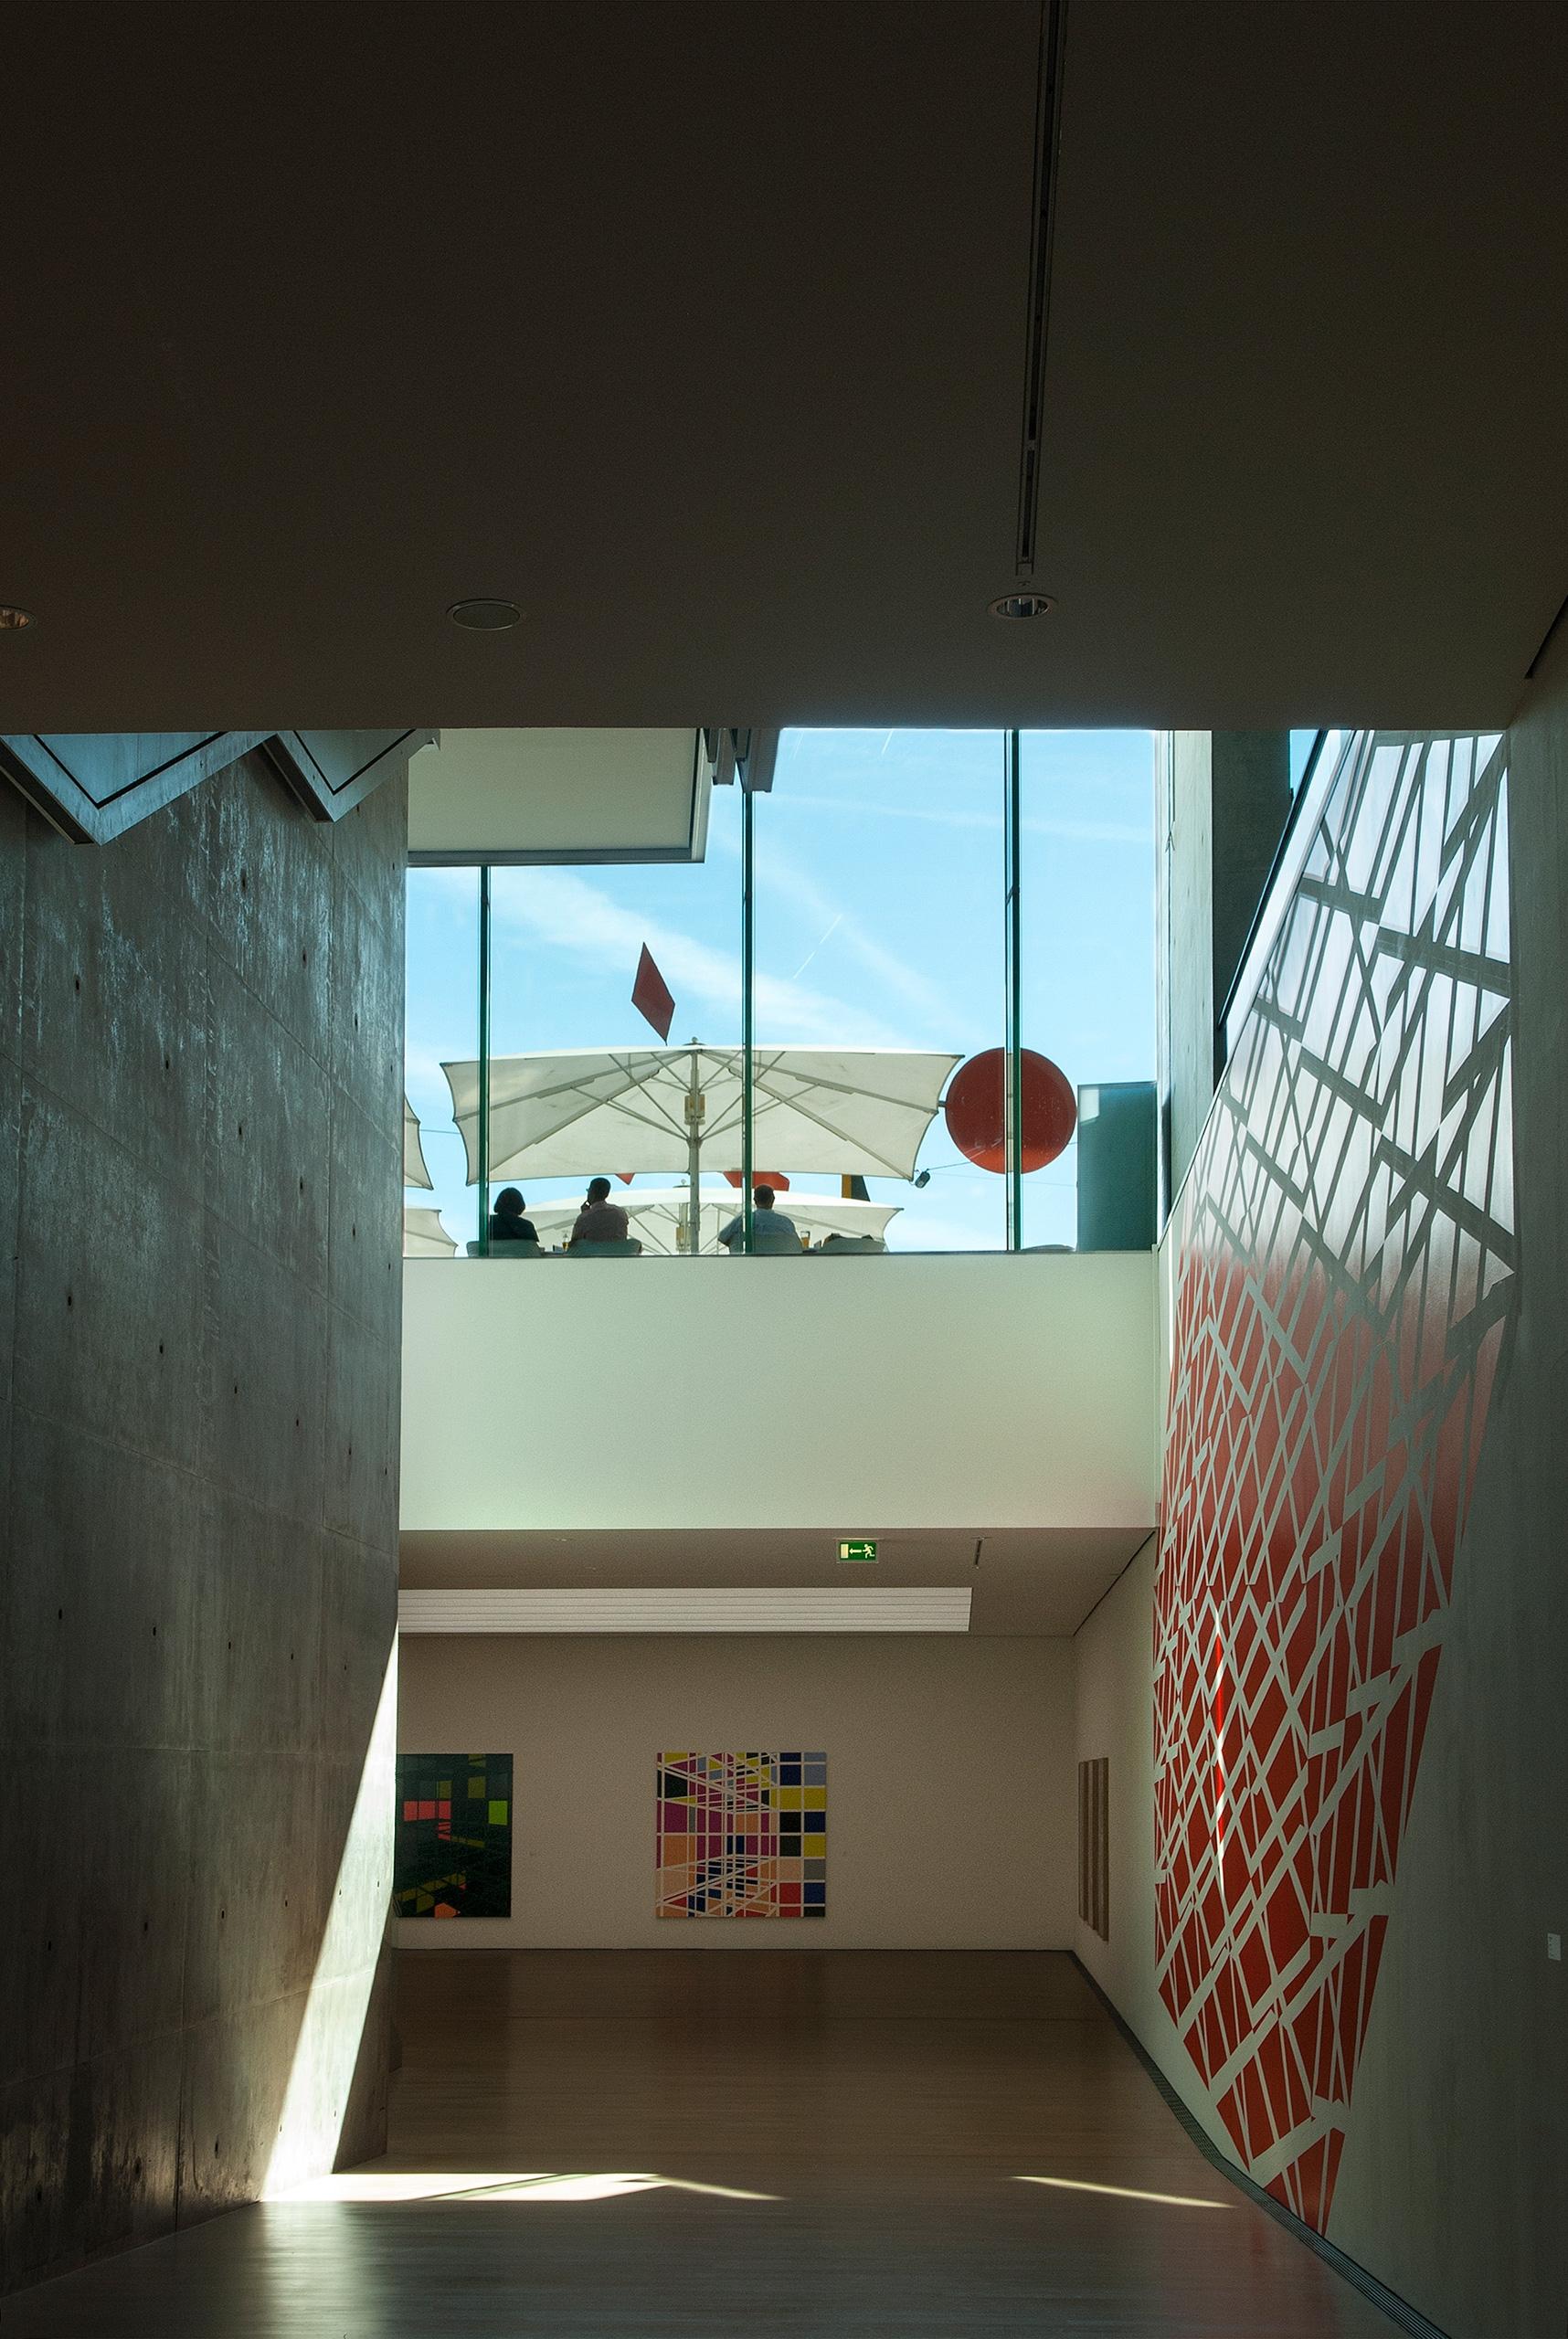 squares, rectangles sphere - architecture - christofkessemeier | ello